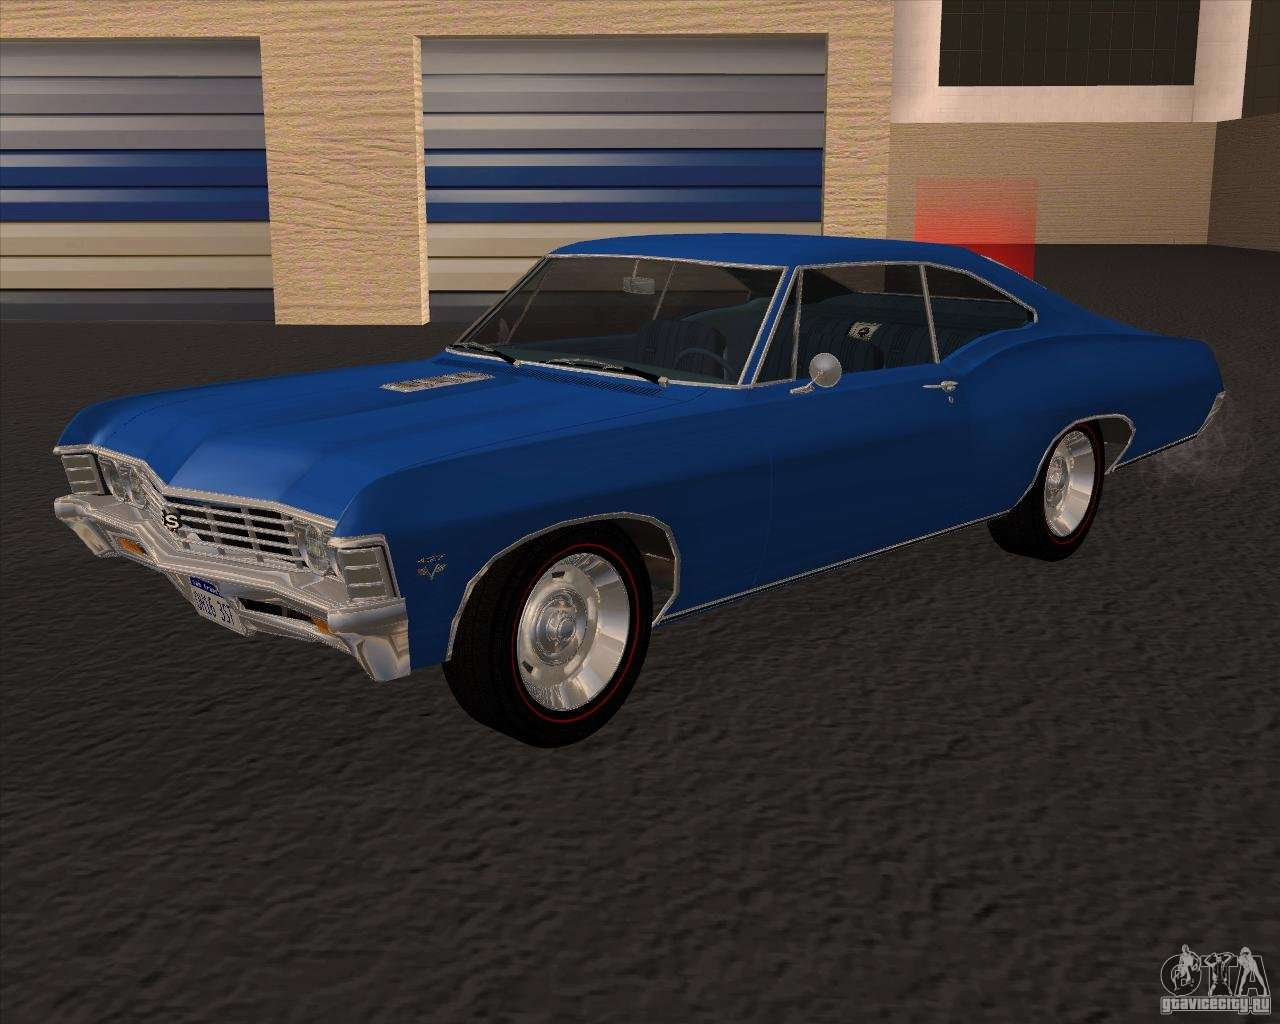 Chevrolet impala 4 door hardtop 1963 for gta san andreas - Chevrolet Impala 427 Ss 1967 For Gta San Andreas